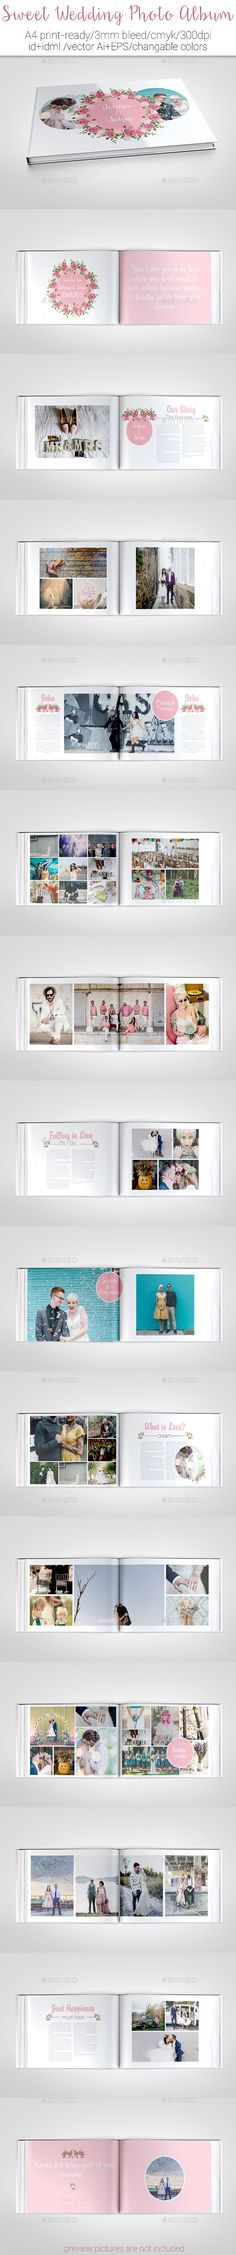 Sweet Wedding Photo Album Template #design #print Download: http://graphicriver.net/item/sweet-wedding-photo-album/11814114?ref=ksioks